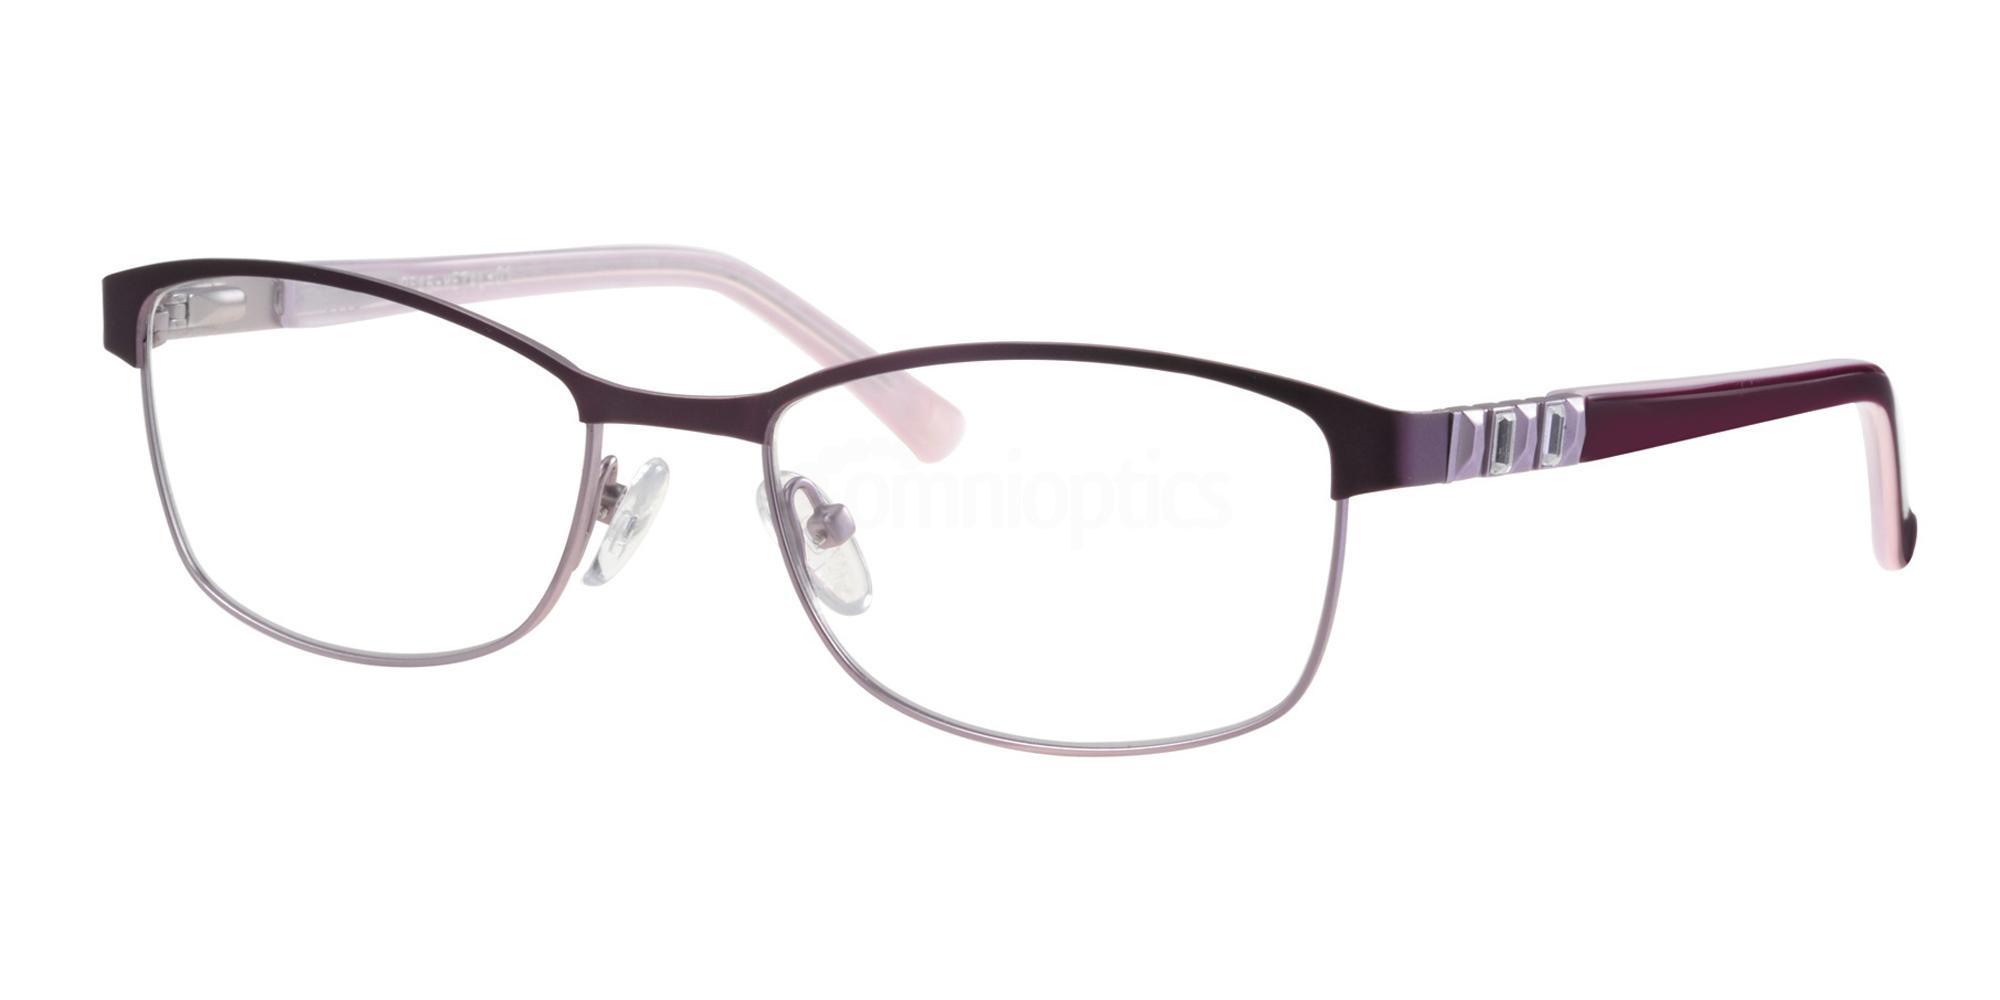 C01 2546 Glasses, Joia